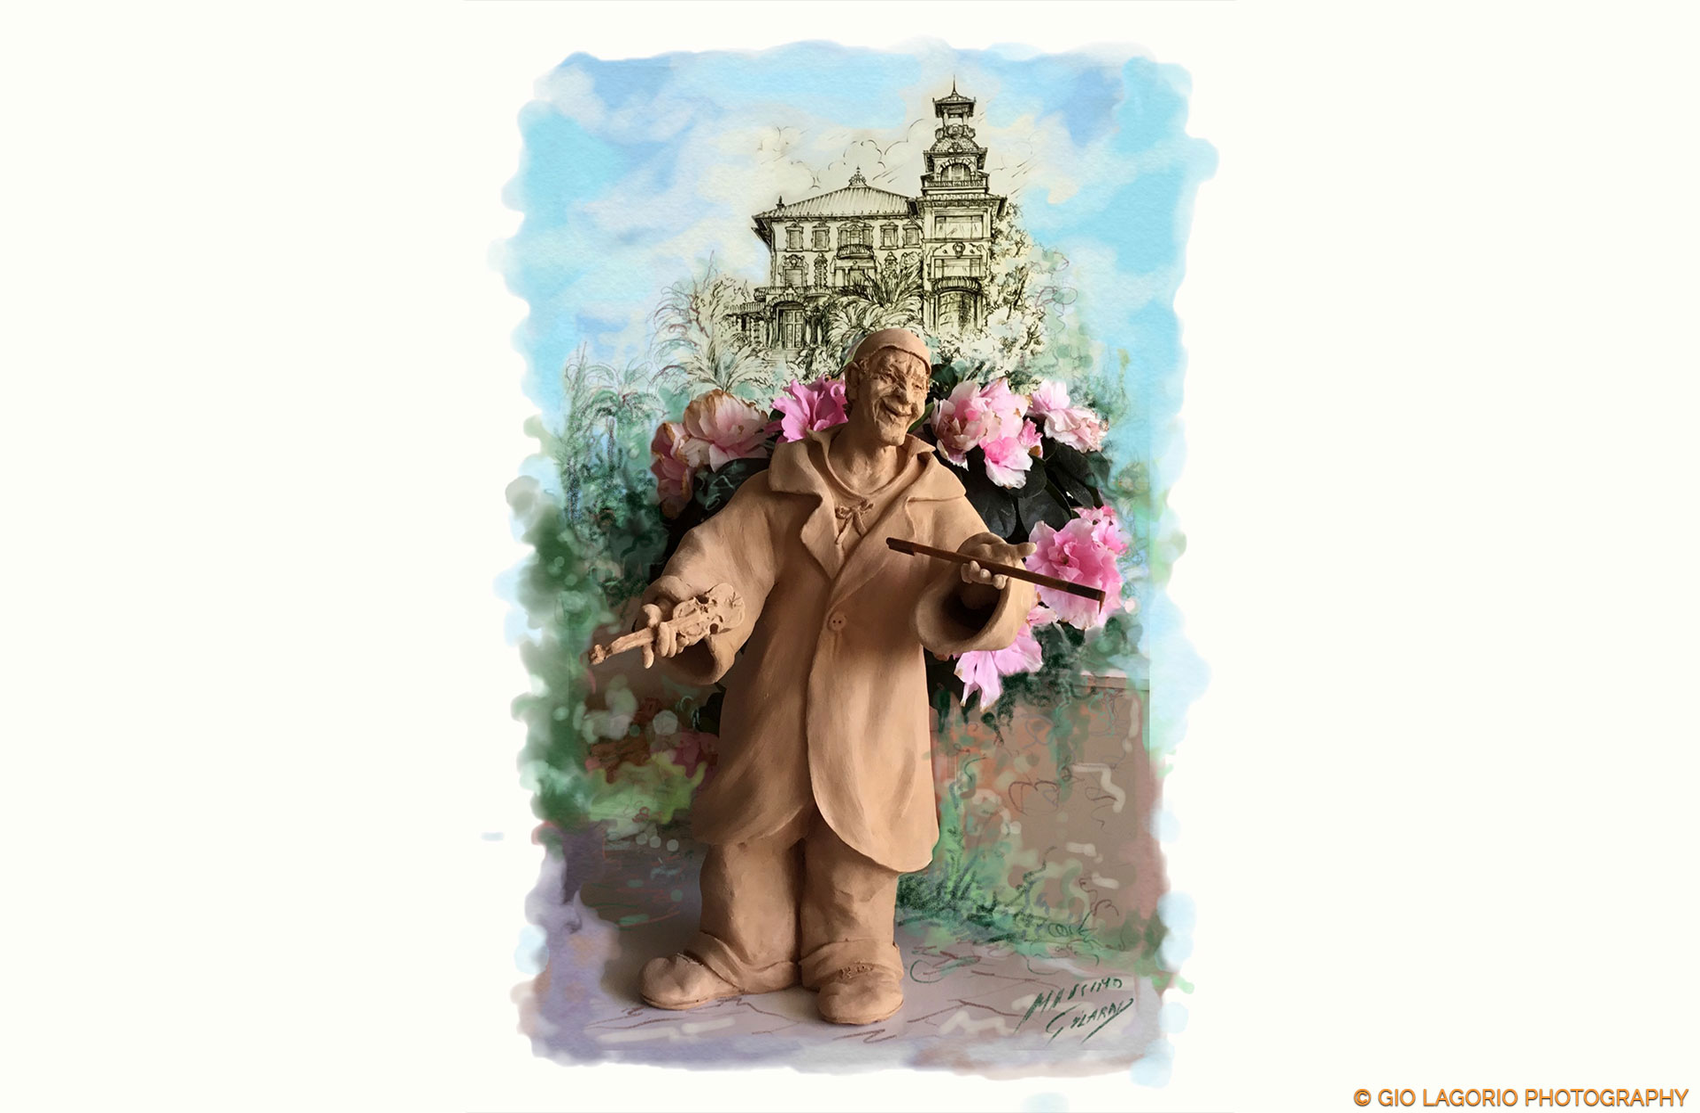 Terracotta di Massimo Gilardi raffigurante Grock